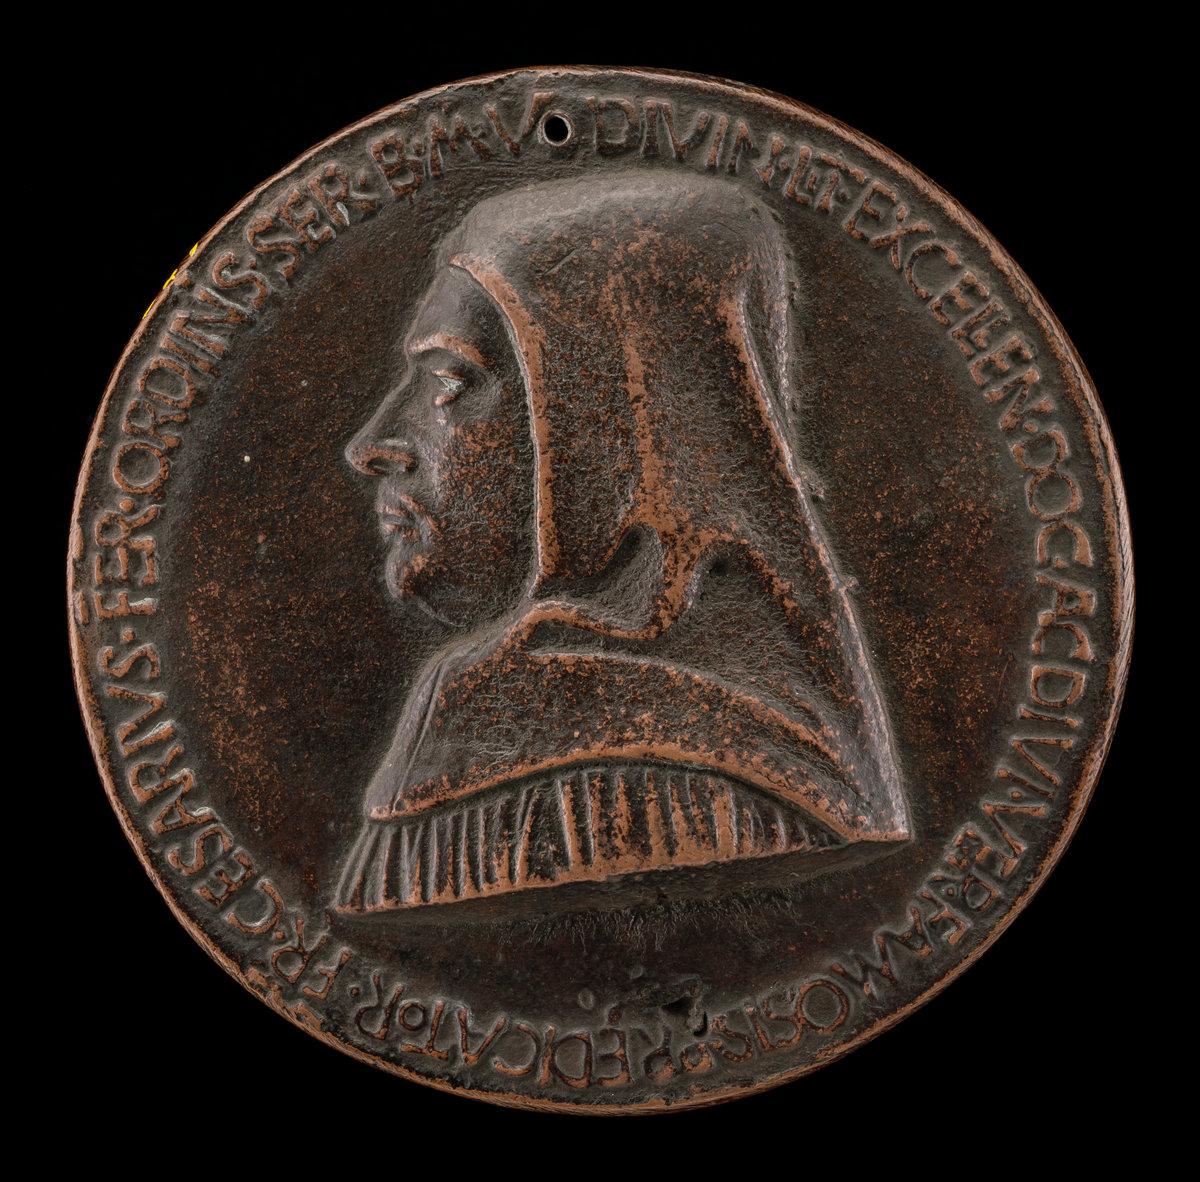 1467-ca-Sperandio-di-Bartolommeo-de-Savelli-Fra-Cesario-Contughi-di-Ferrara-NGA-A-